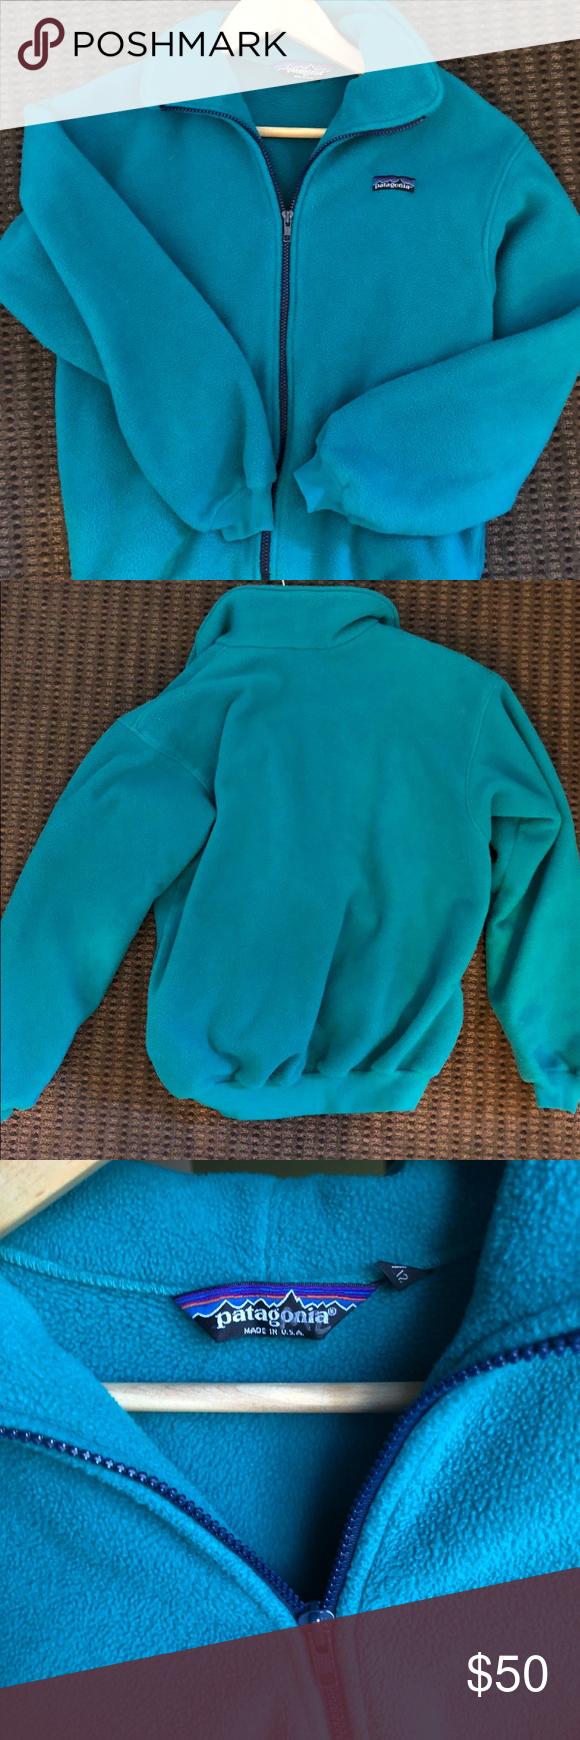 one day sale patagonia fleece jacket my posh picks